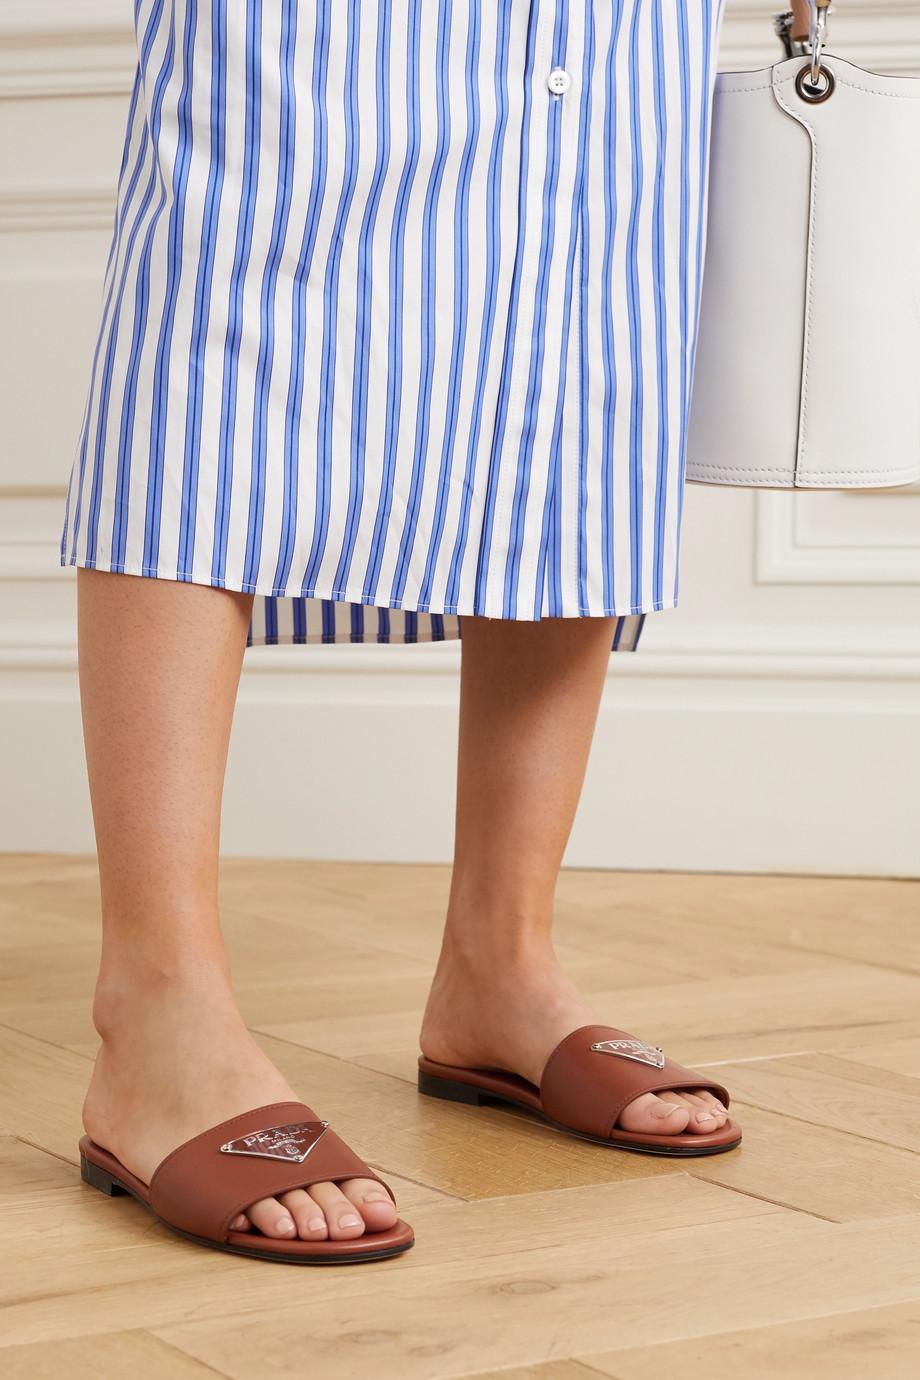 Prada Pantoletten aus Leder mit Logoverzierung